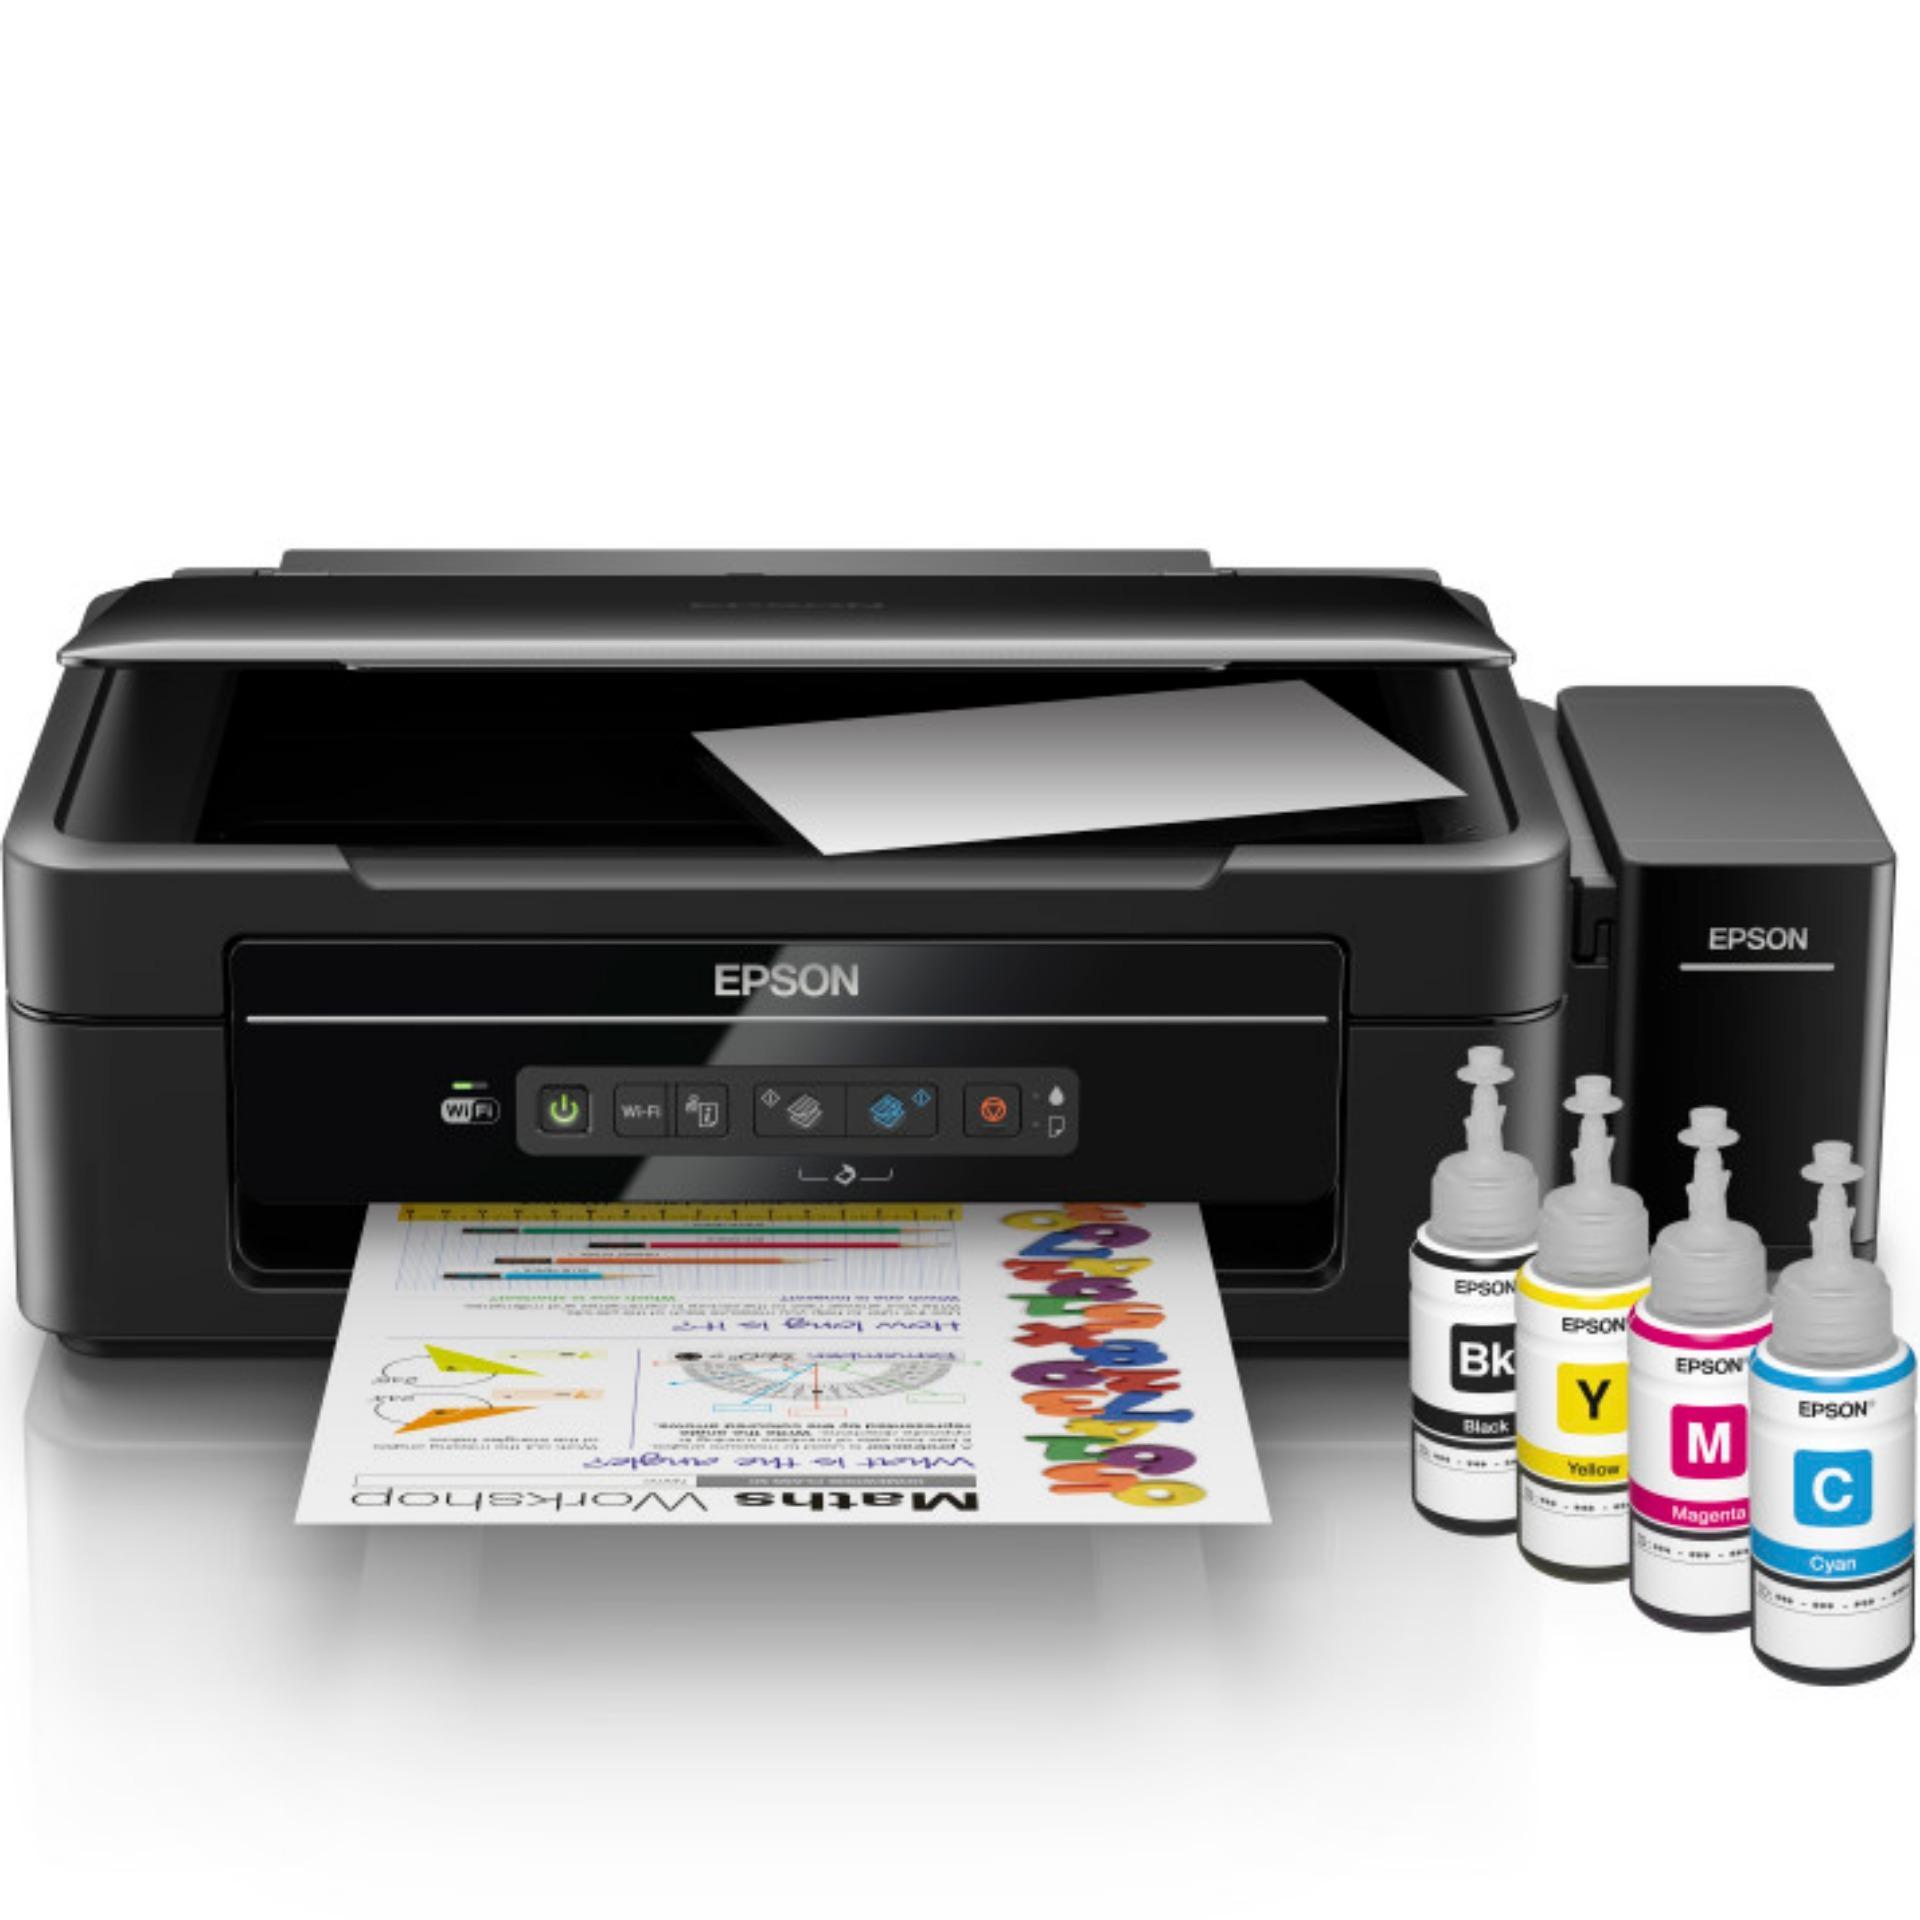 Promo Epson Printer L385 Hitam Banten